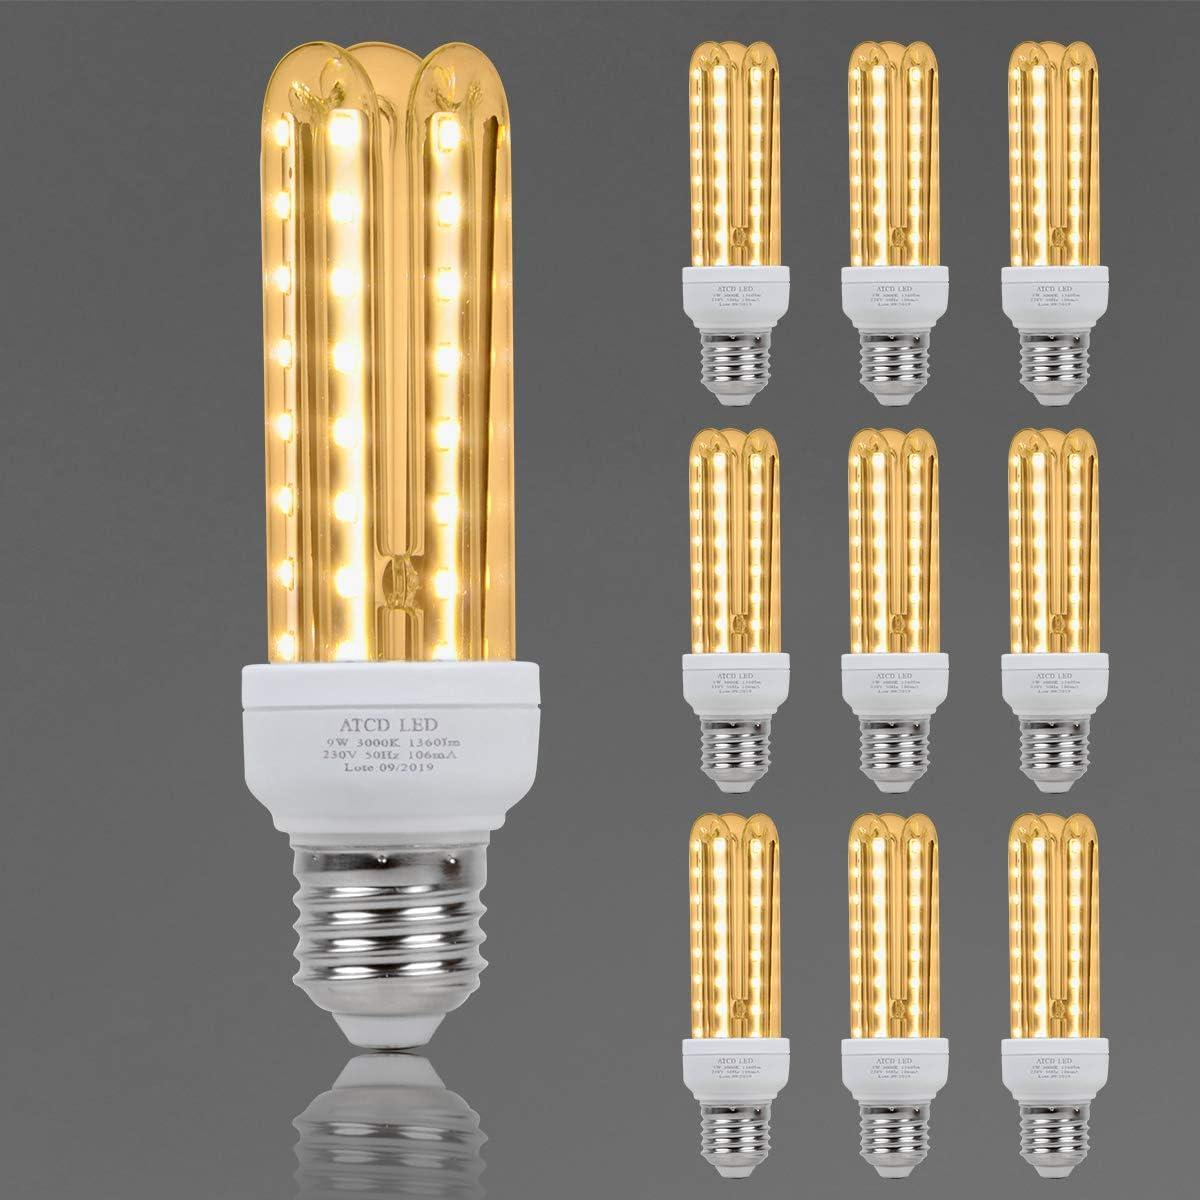 Bombilla LED, ATCD Bombillas Led e27 Luz Calida, Bombilla Led Estándar e27 3U, 9 W Equivalente a 70 W, Luz Calida 3000K, 810 Lúmenes, No Regulable - Pack de 10 [Clase de Eficiencia Energética A]